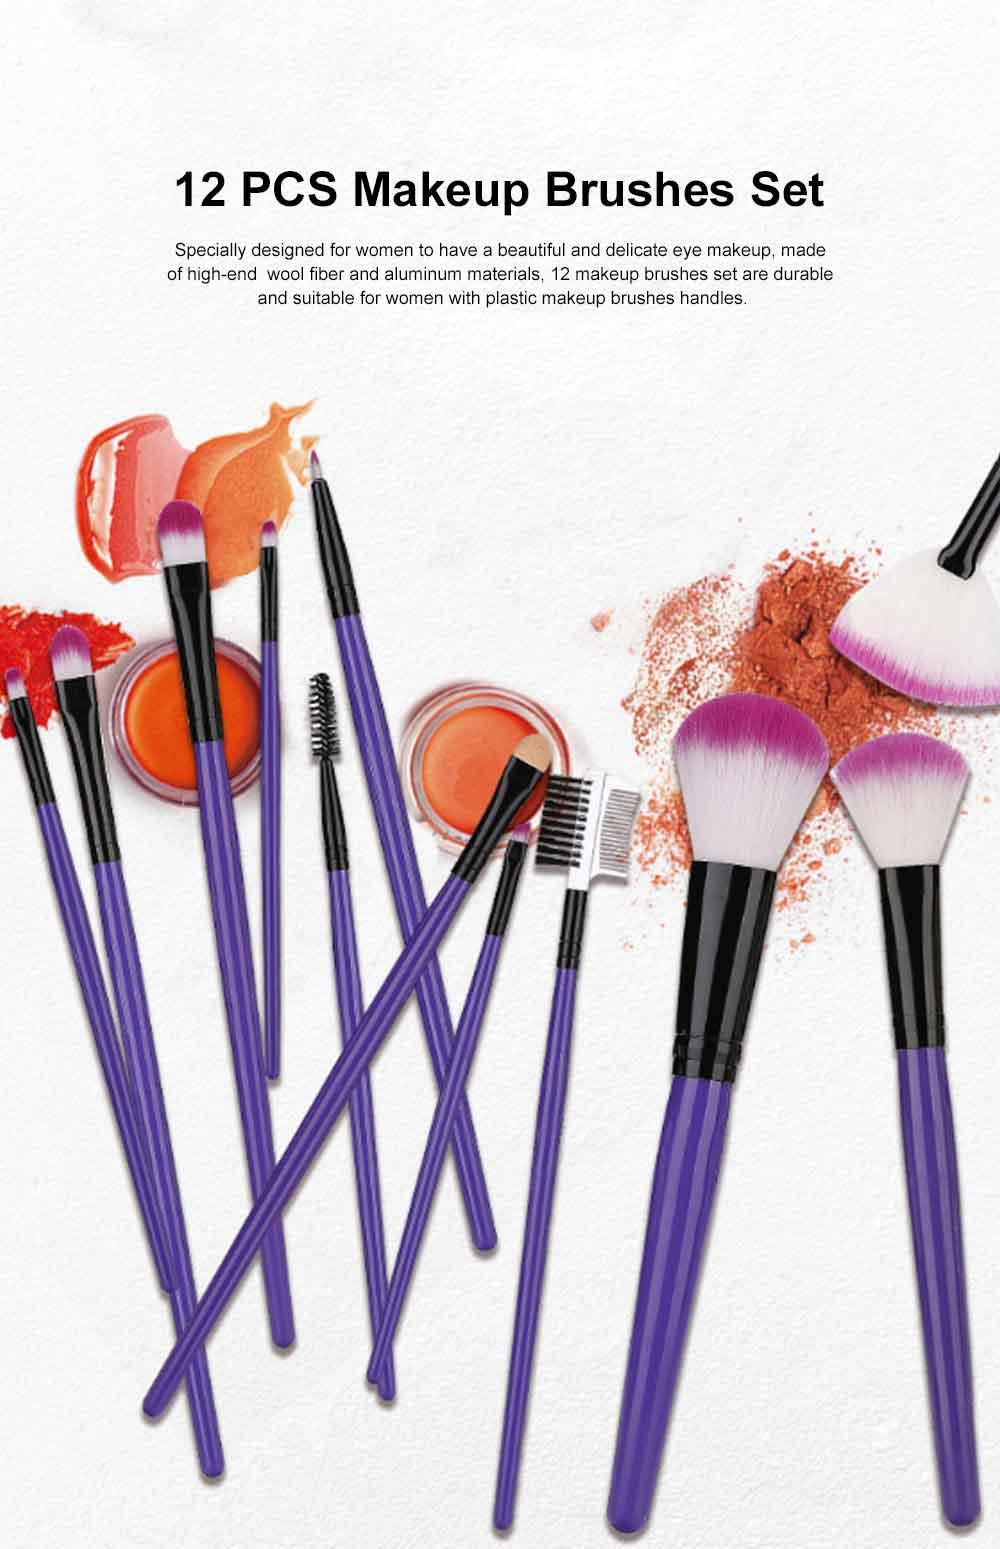 12PCS Makeup Brushes Set Makeup Brushes for Eye-shadow Concealer Eyeliner Brow Blending Brush Cosmetic Tool 0